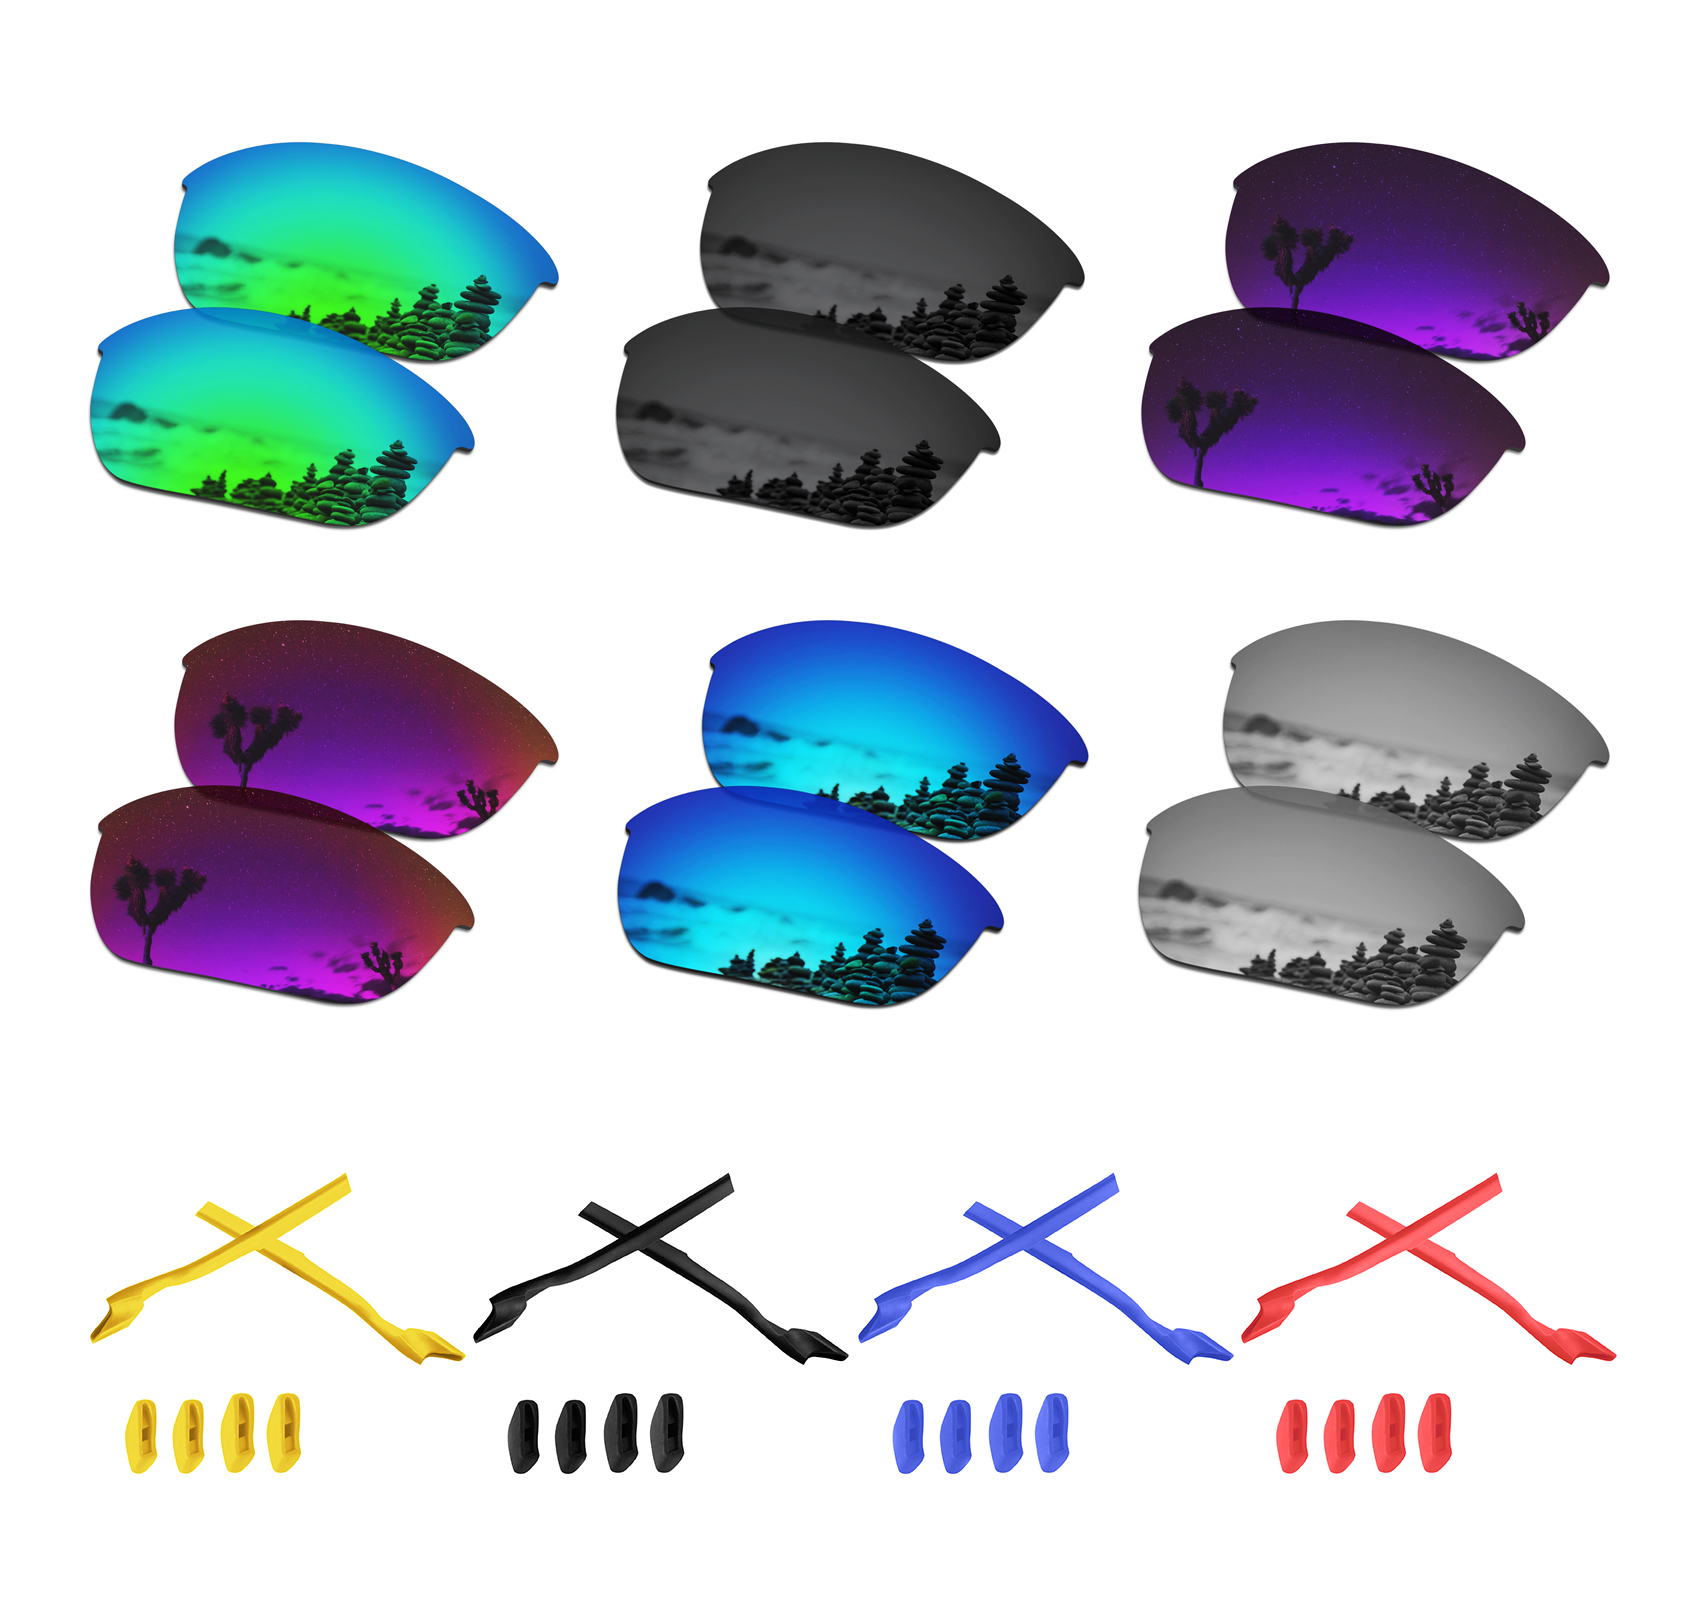 SmartVLT Polarized Replacement Lenses For Oakley Half Jacket 2.0 Sunglasses - Multiple Options